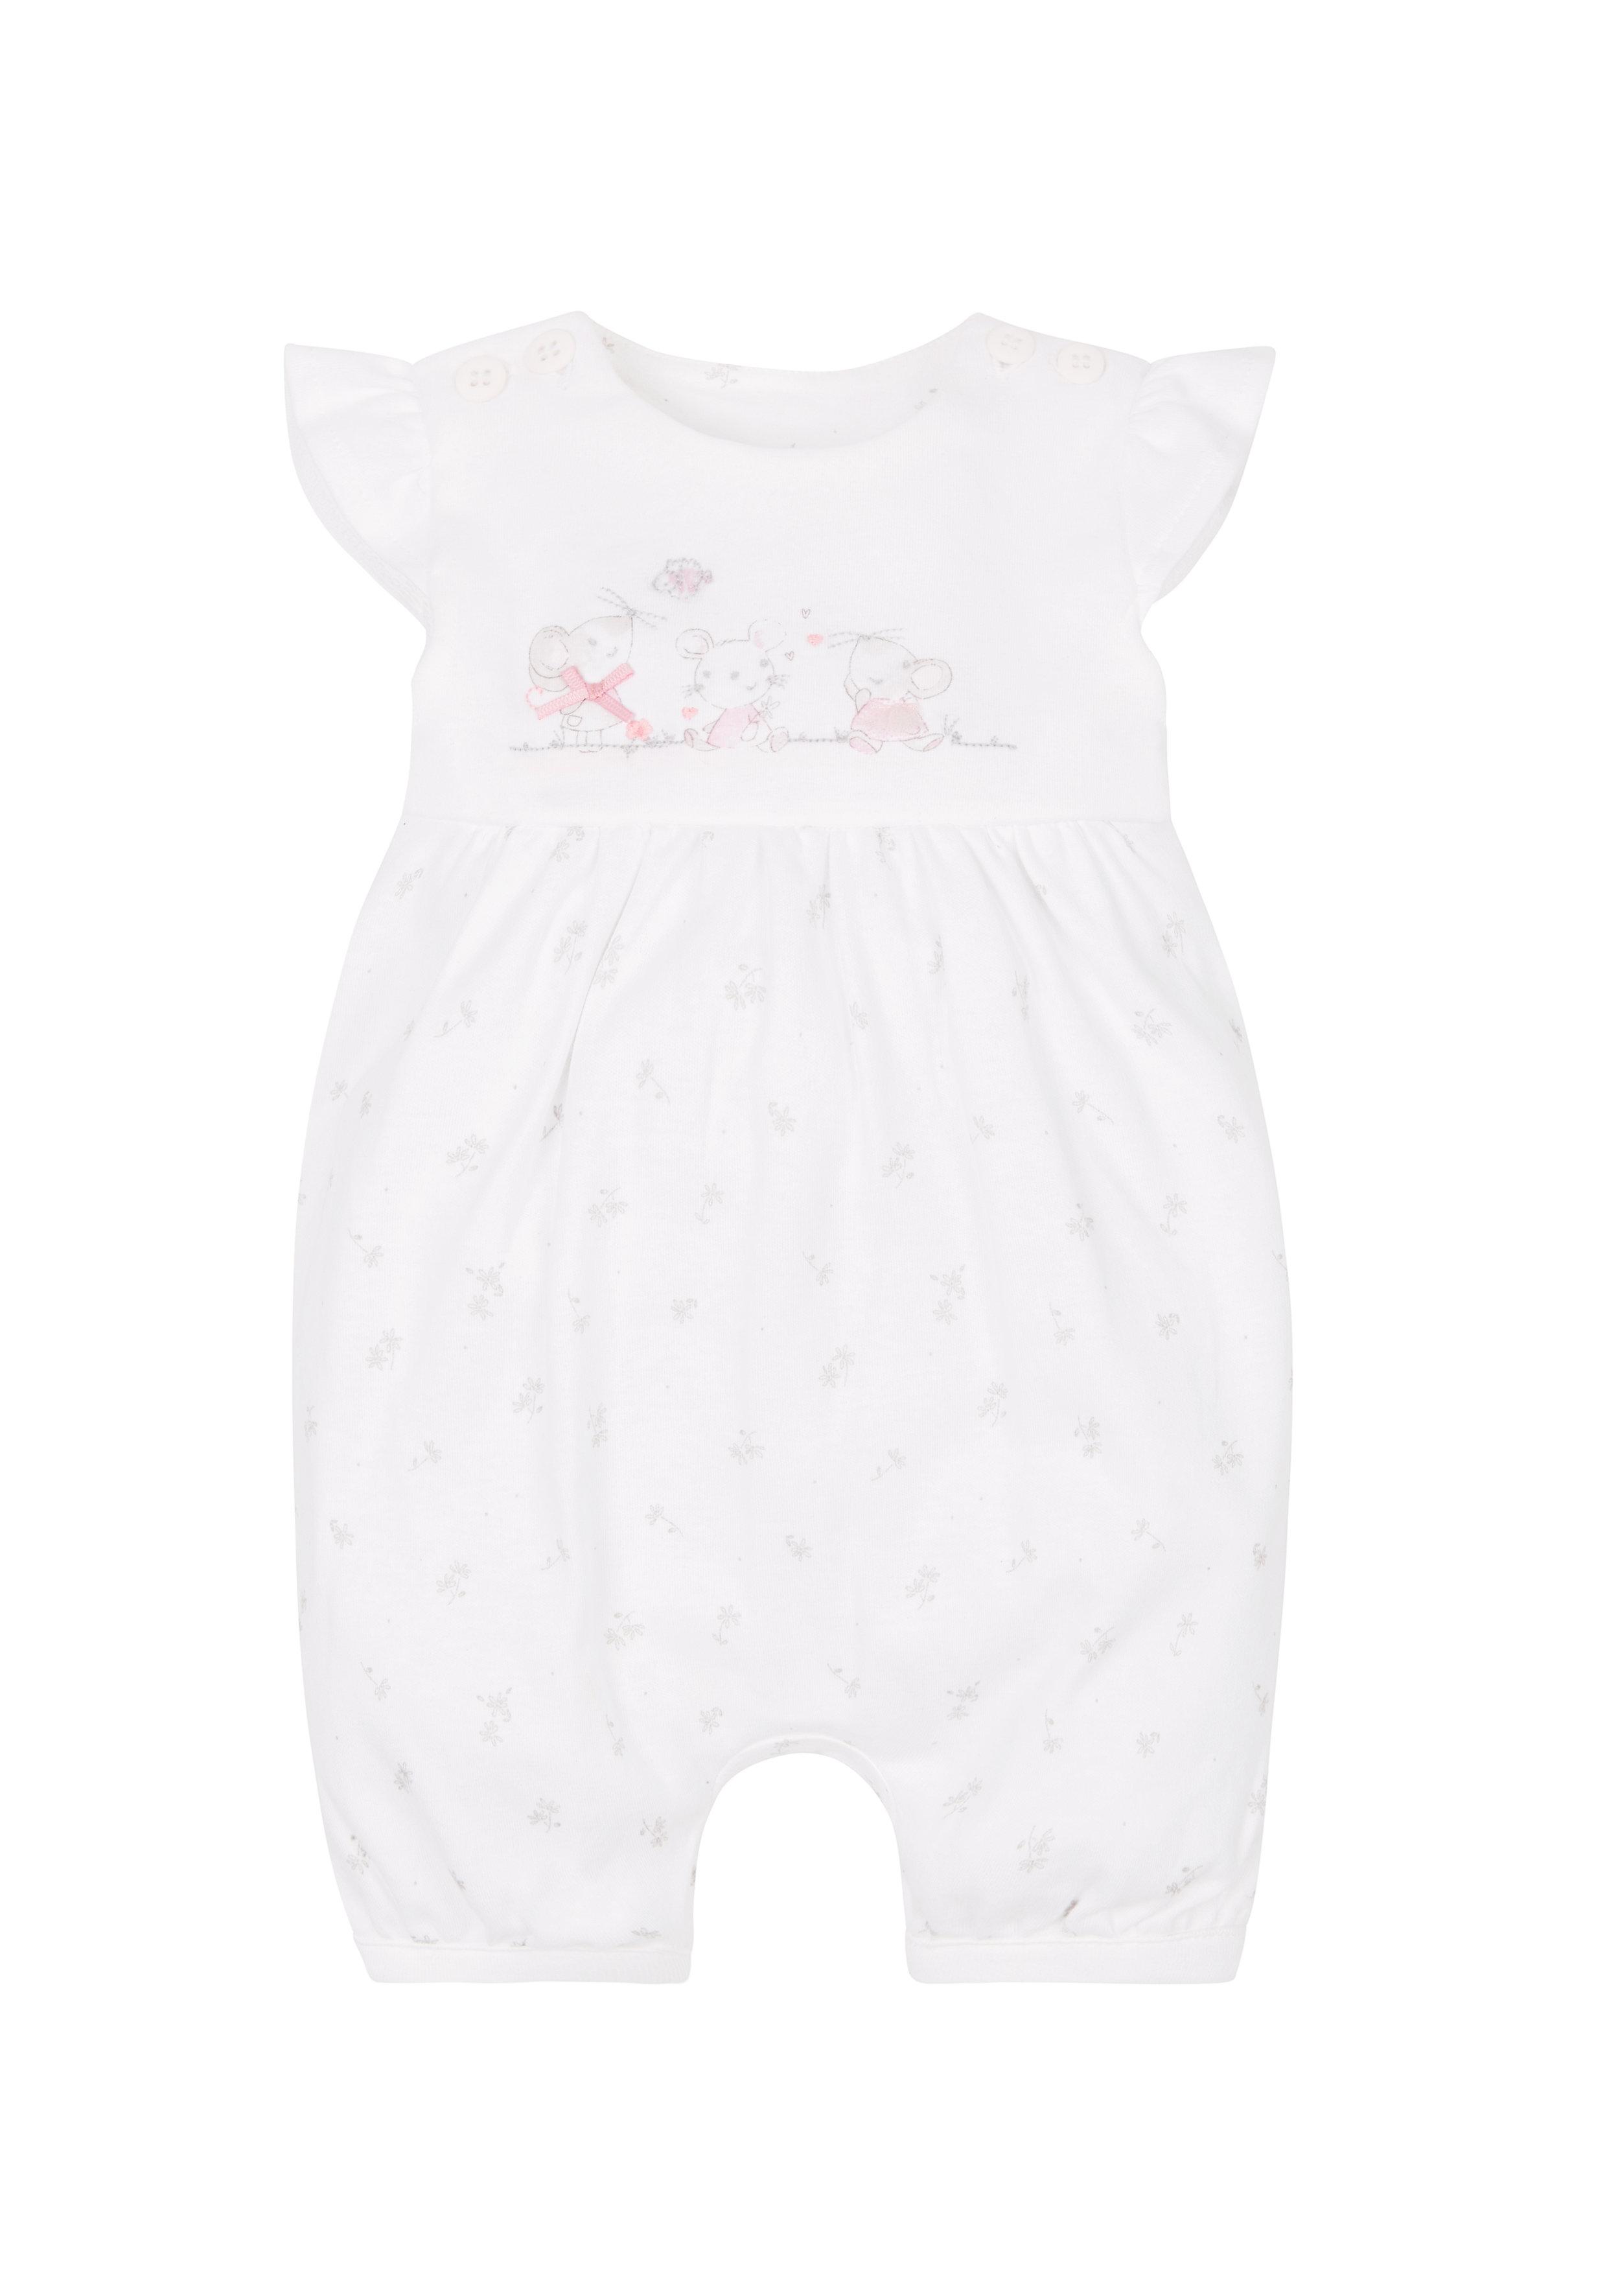 Mothercare | Girls Little Mouse Romper - White